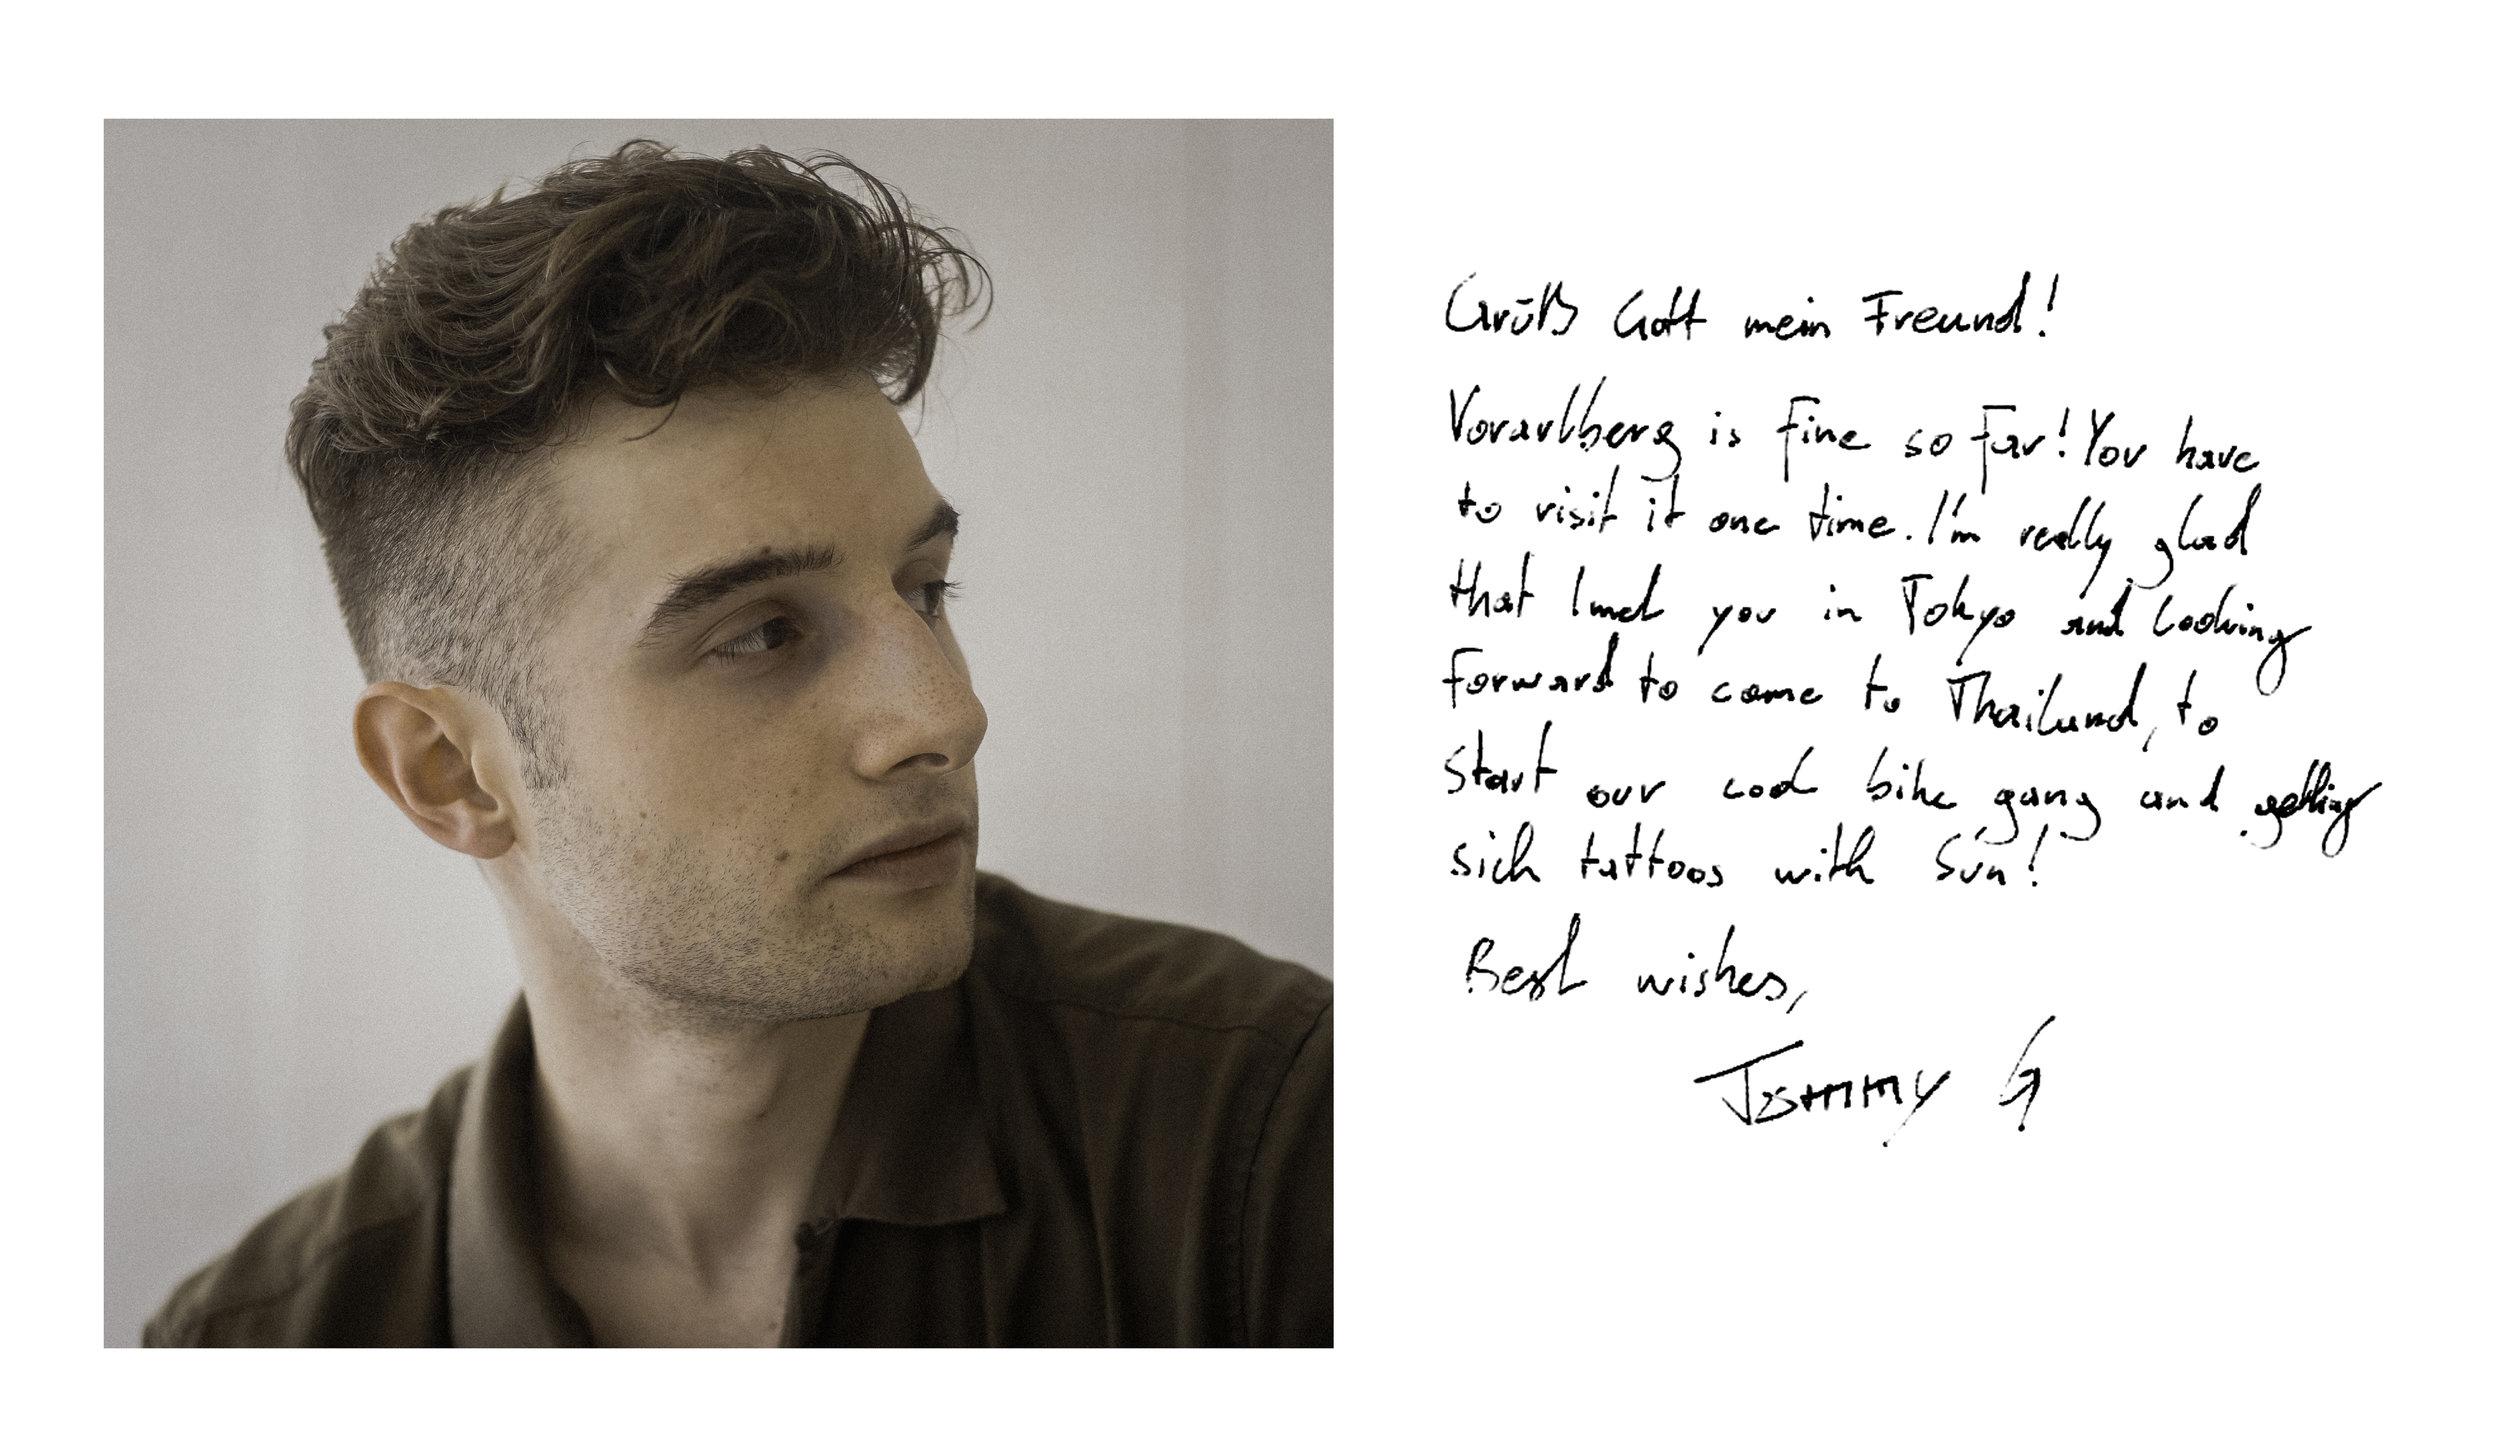 Tommy_letter.jpg